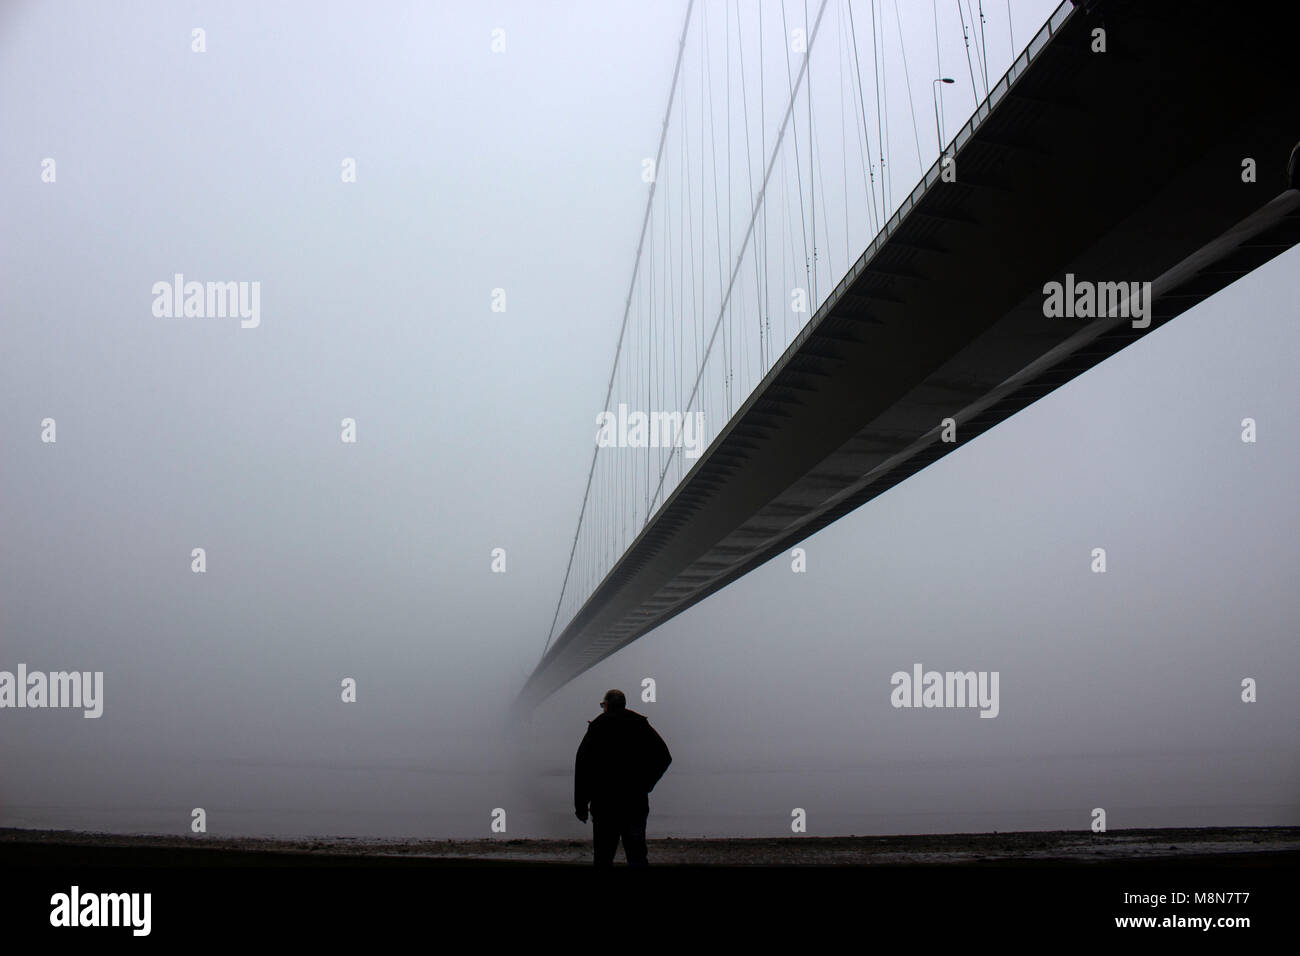 Humber bridge foggy scene with man - Stock Image